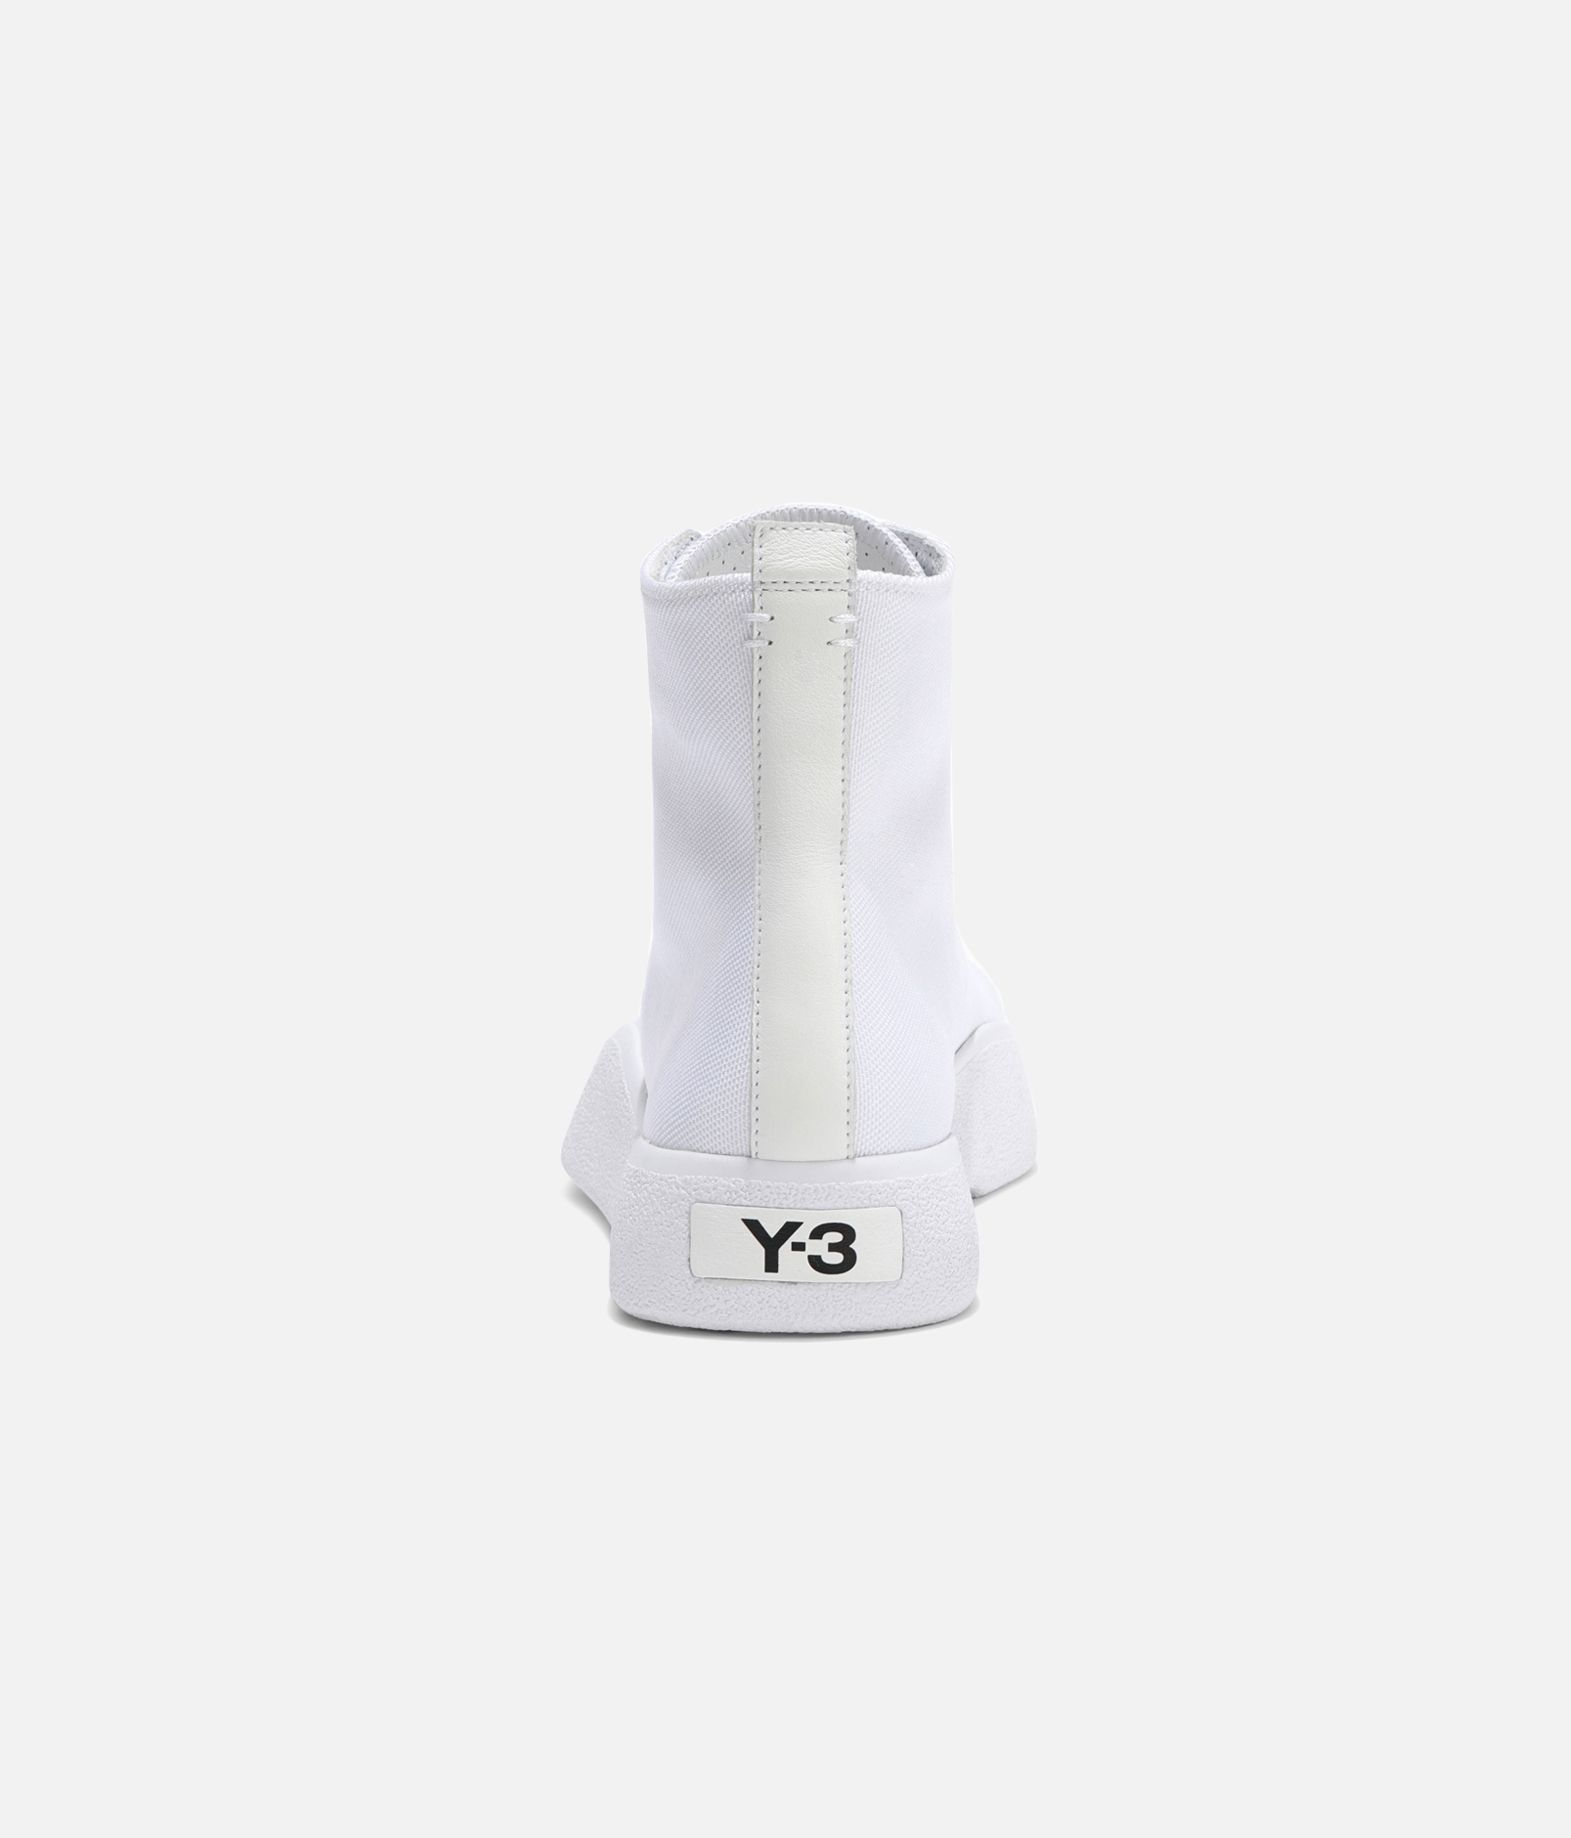 Y-3 Y-3 Bashyo Sneakers alte E r